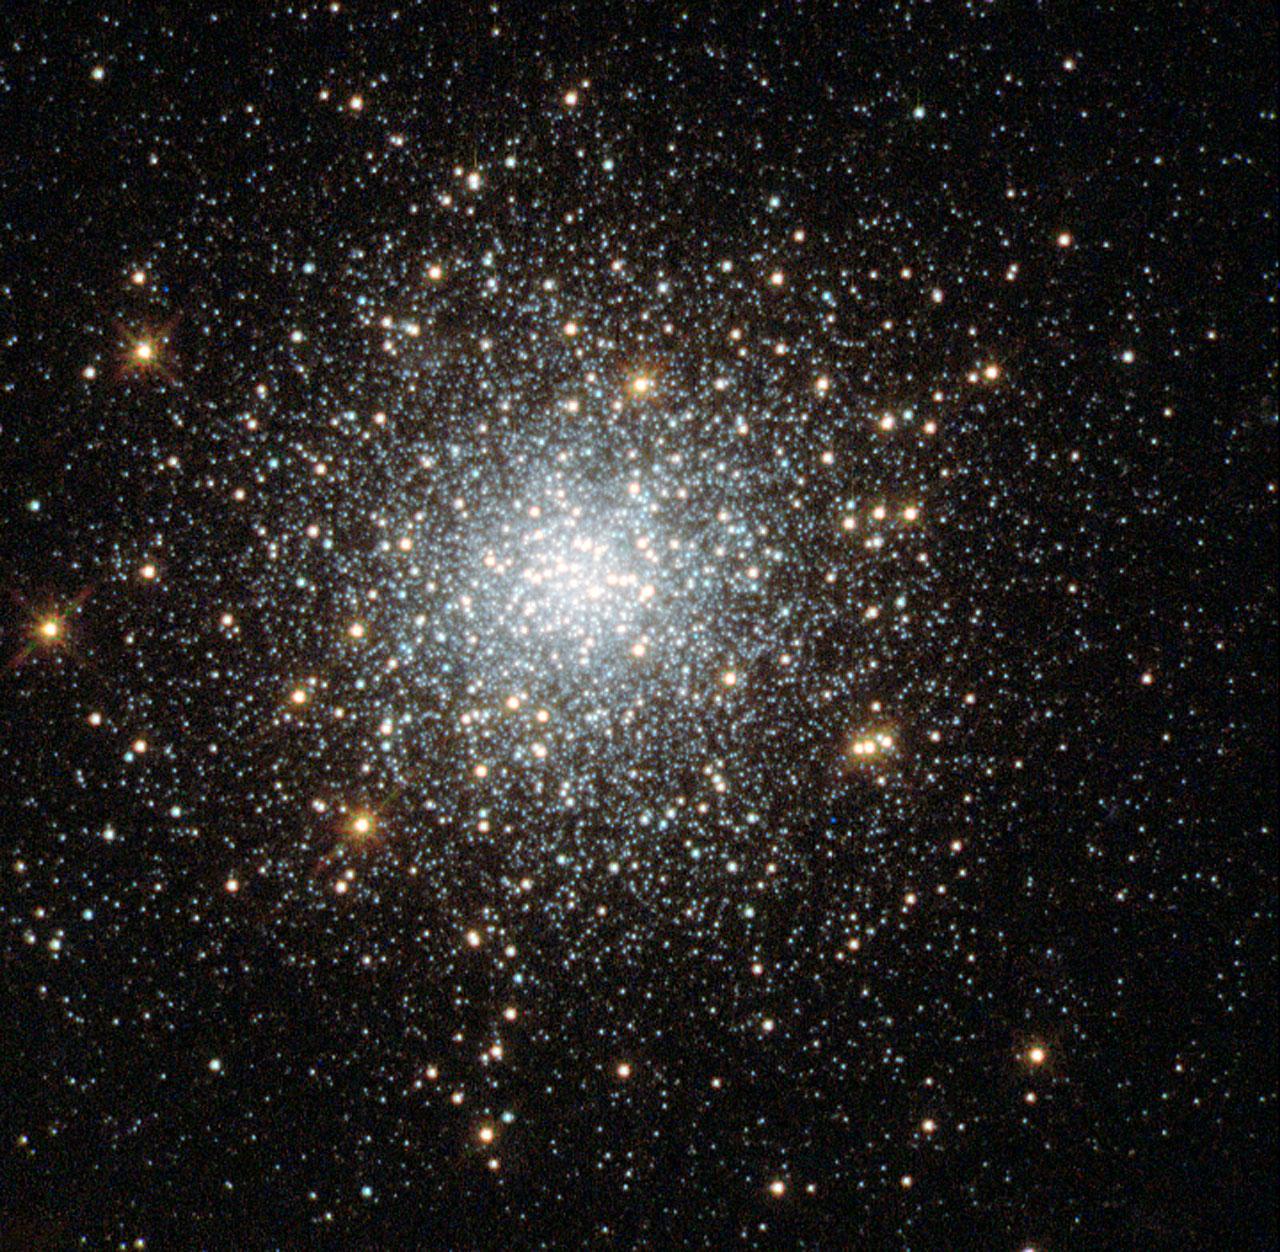 Globular Cluster Fornax 5 Esa Hubble